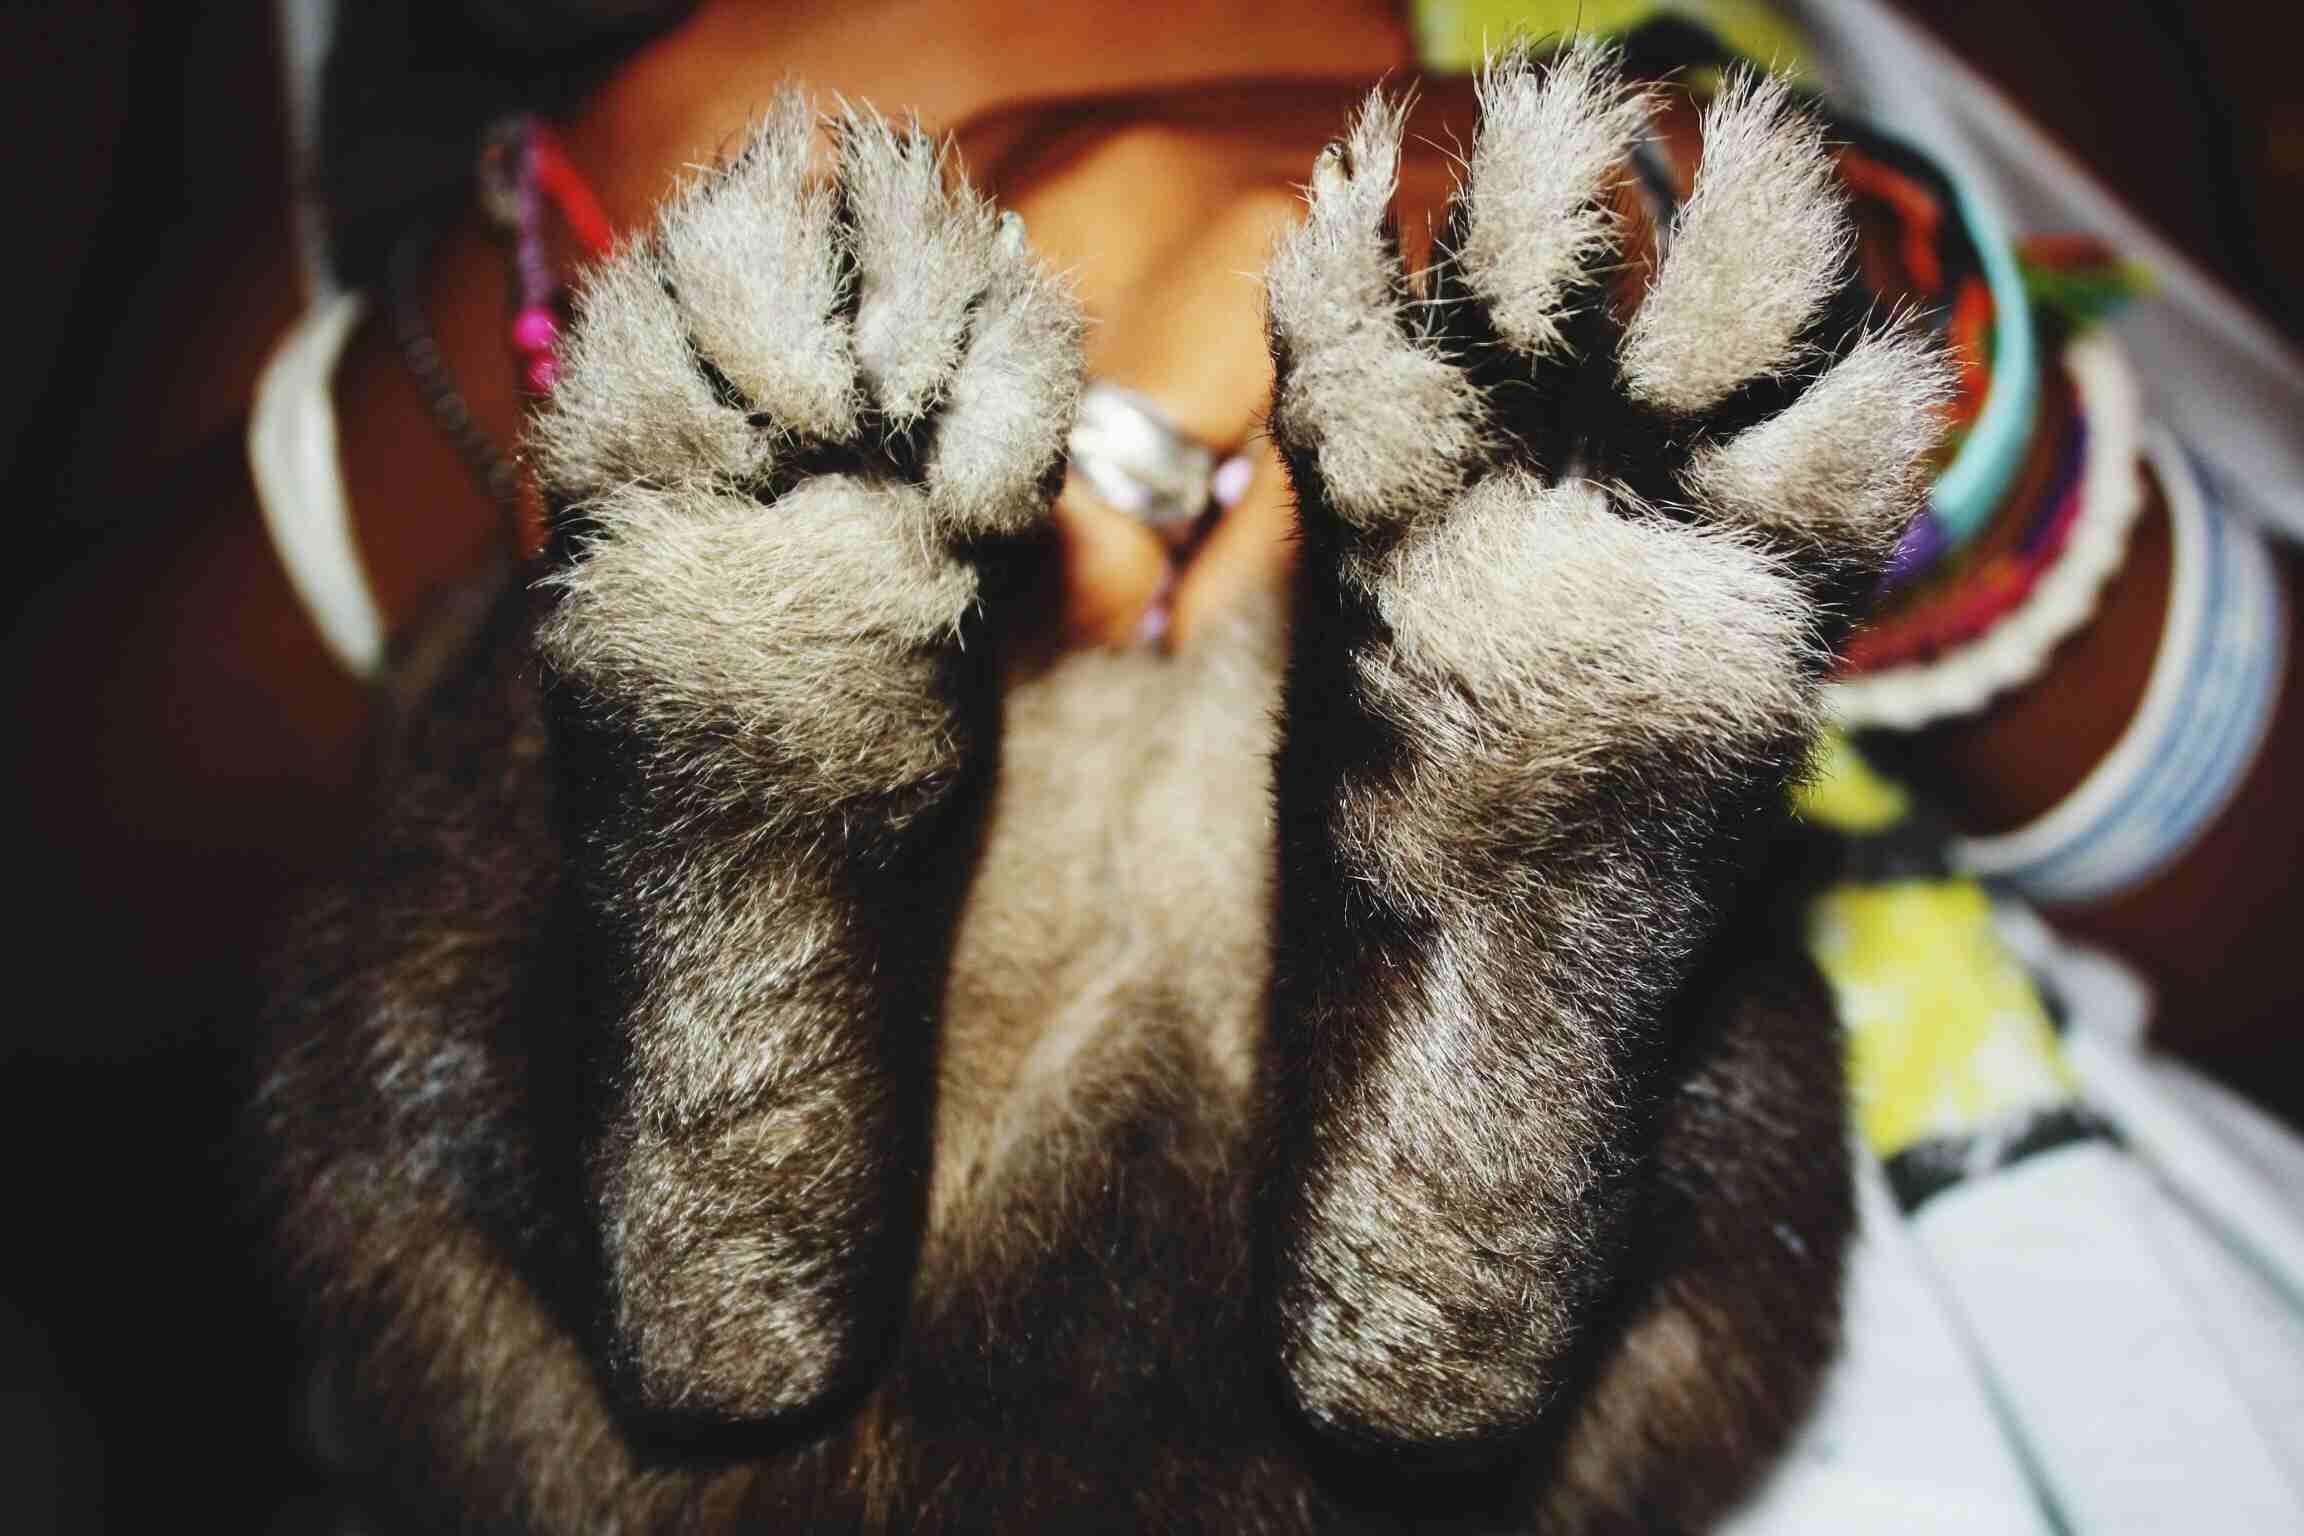 Close-up of rabbit feet